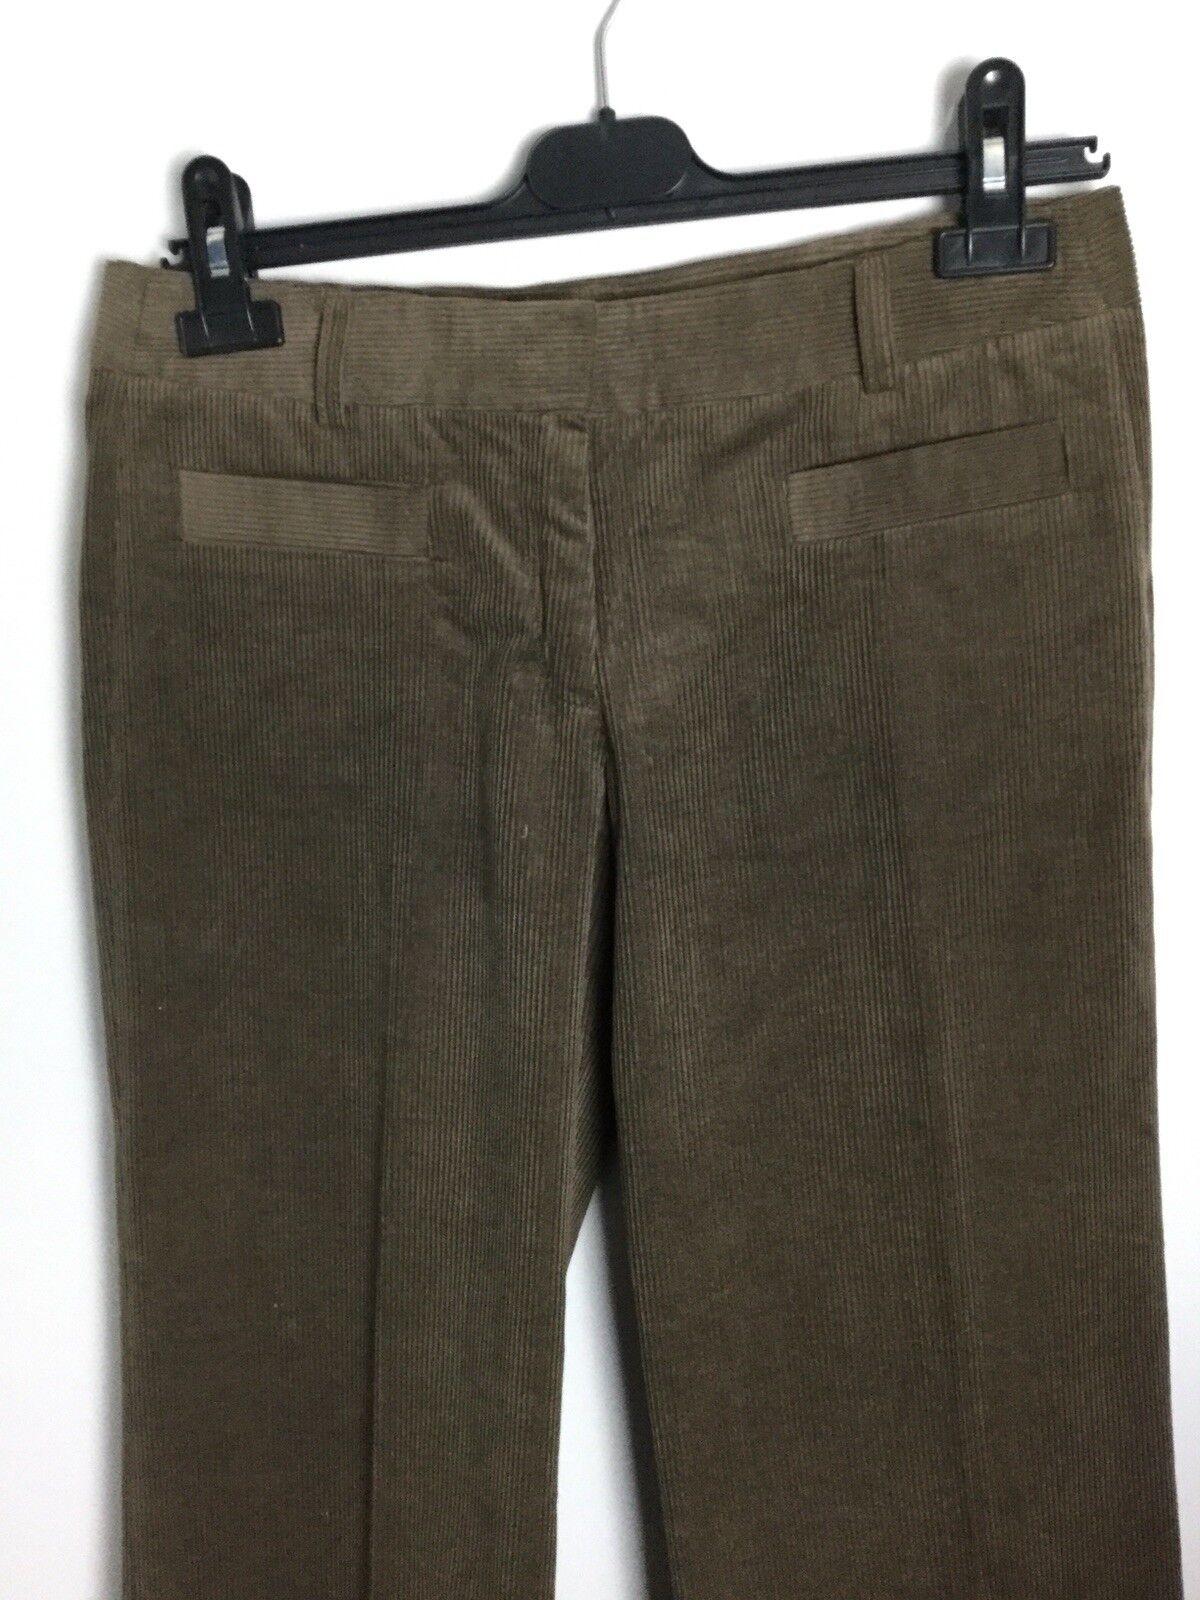 Nicole Farhi Light Brown Corduroy Pants. Size 8-10UK. Ex Condition